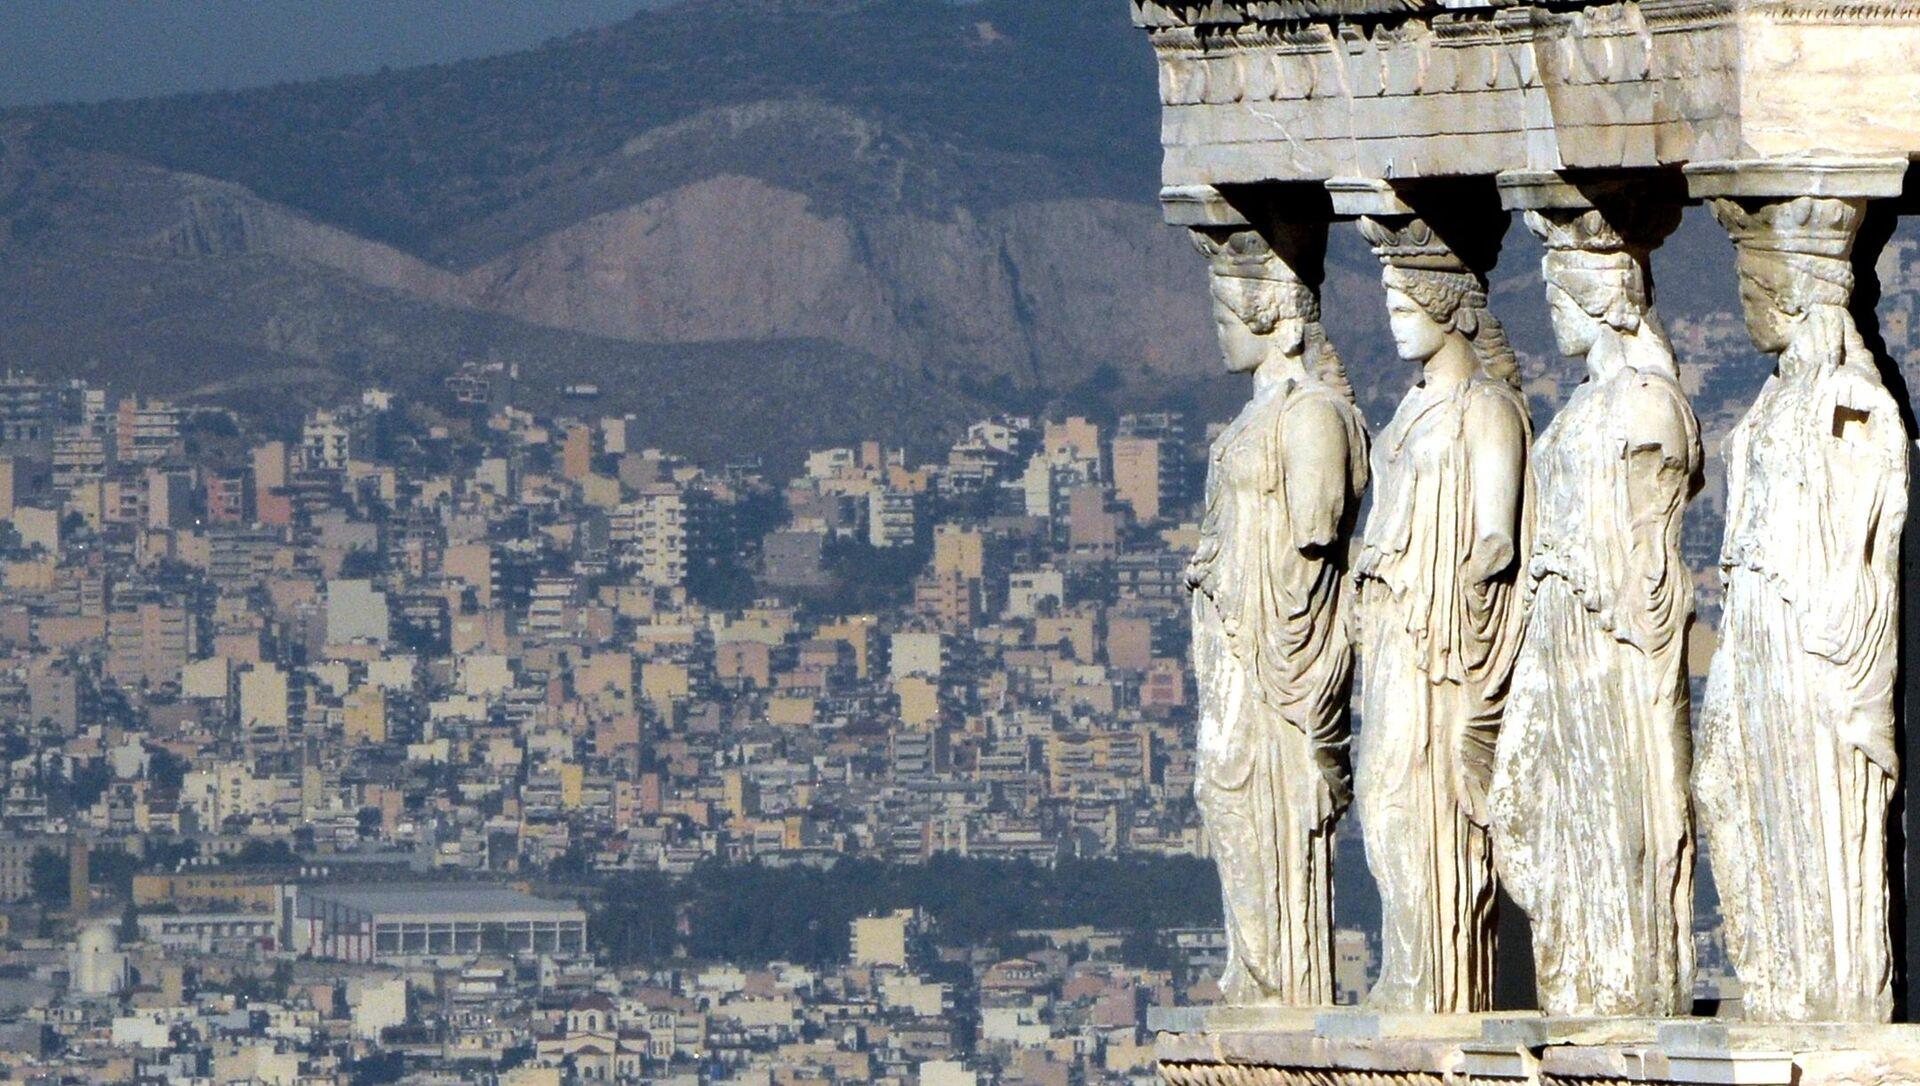 Acropole d'Athènes - Sputnik France, 1920, 17.09.2021